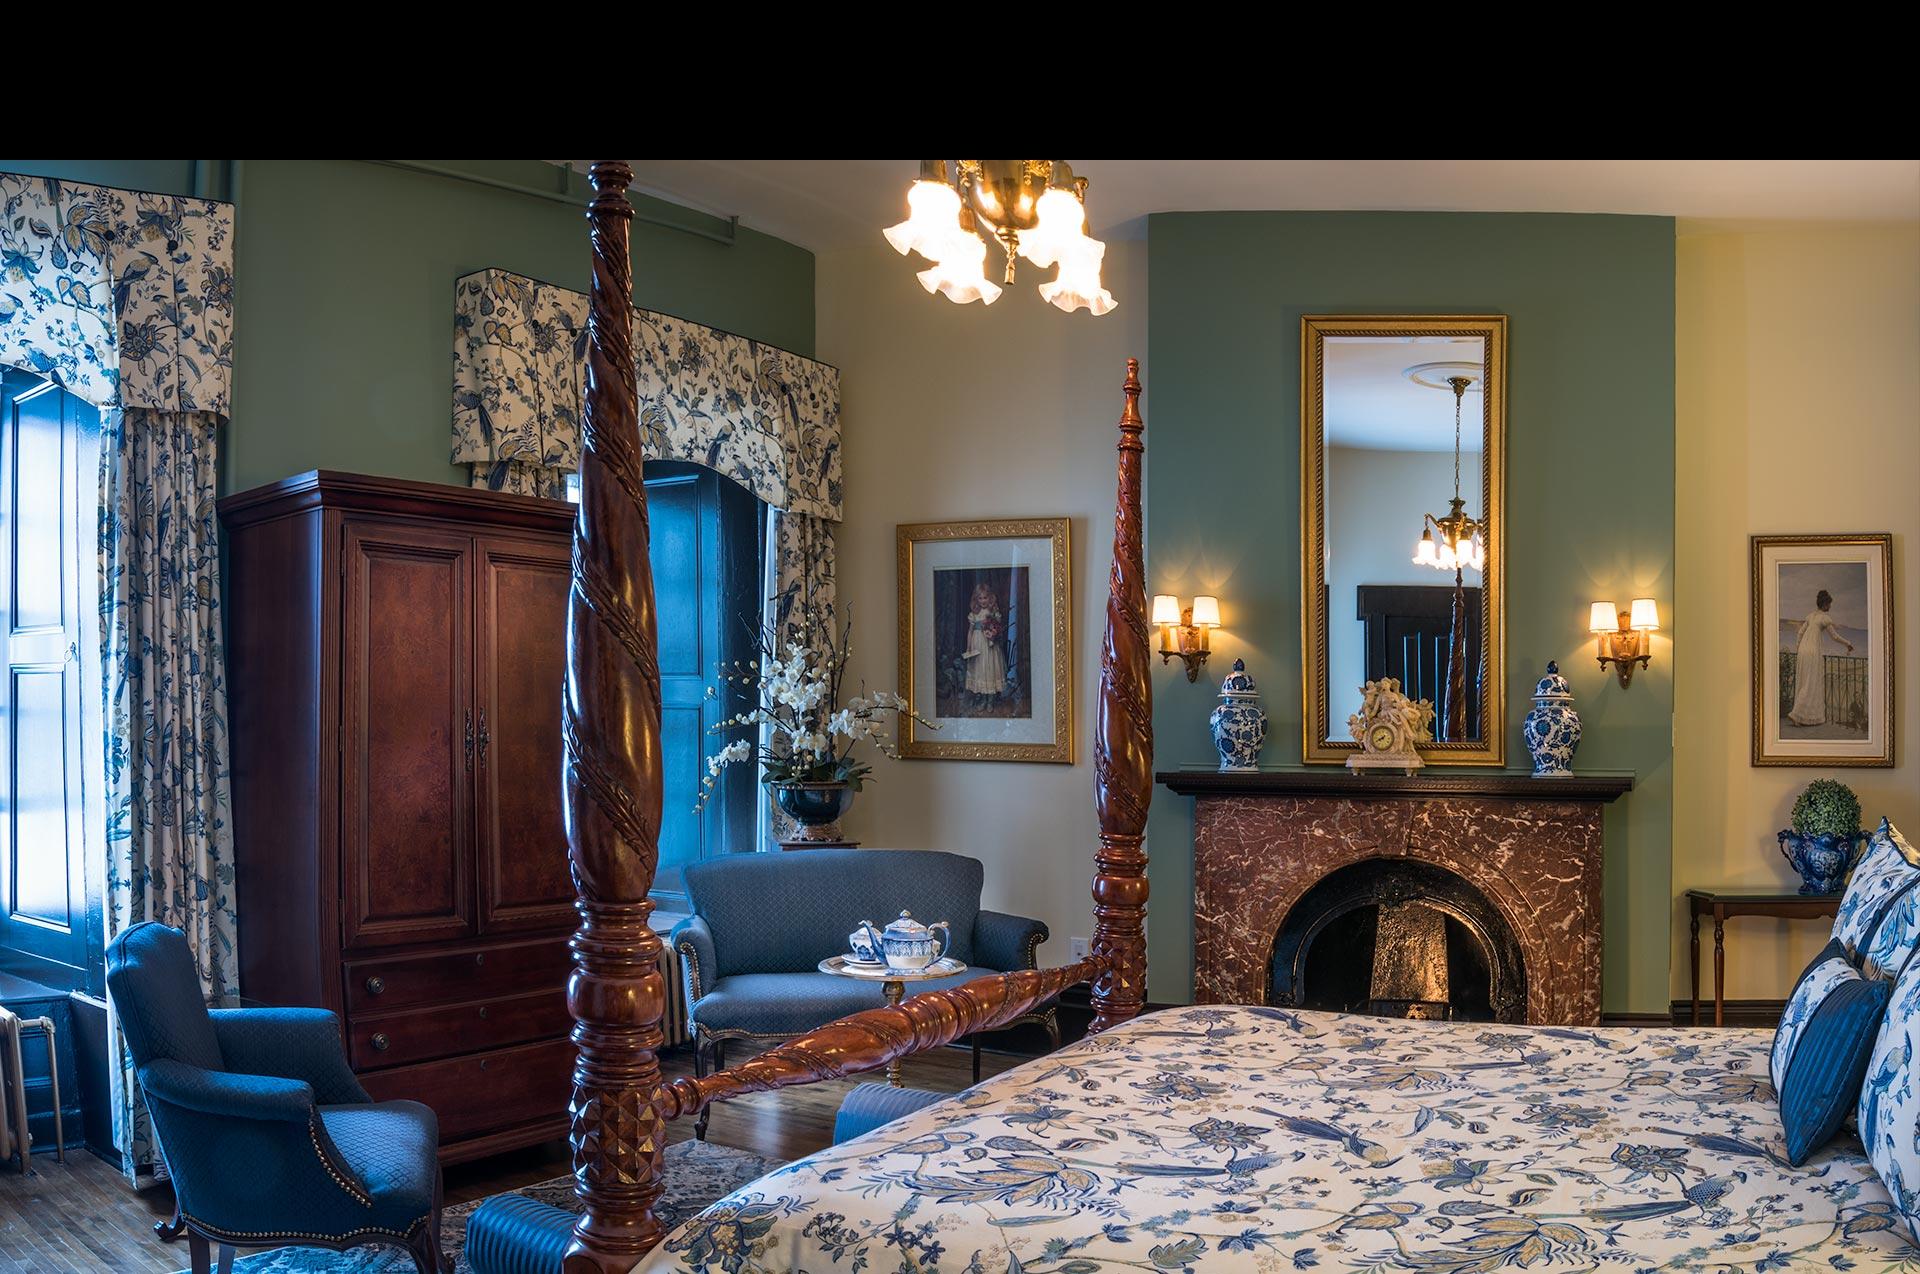 romantic-room-1-chambre-romantique